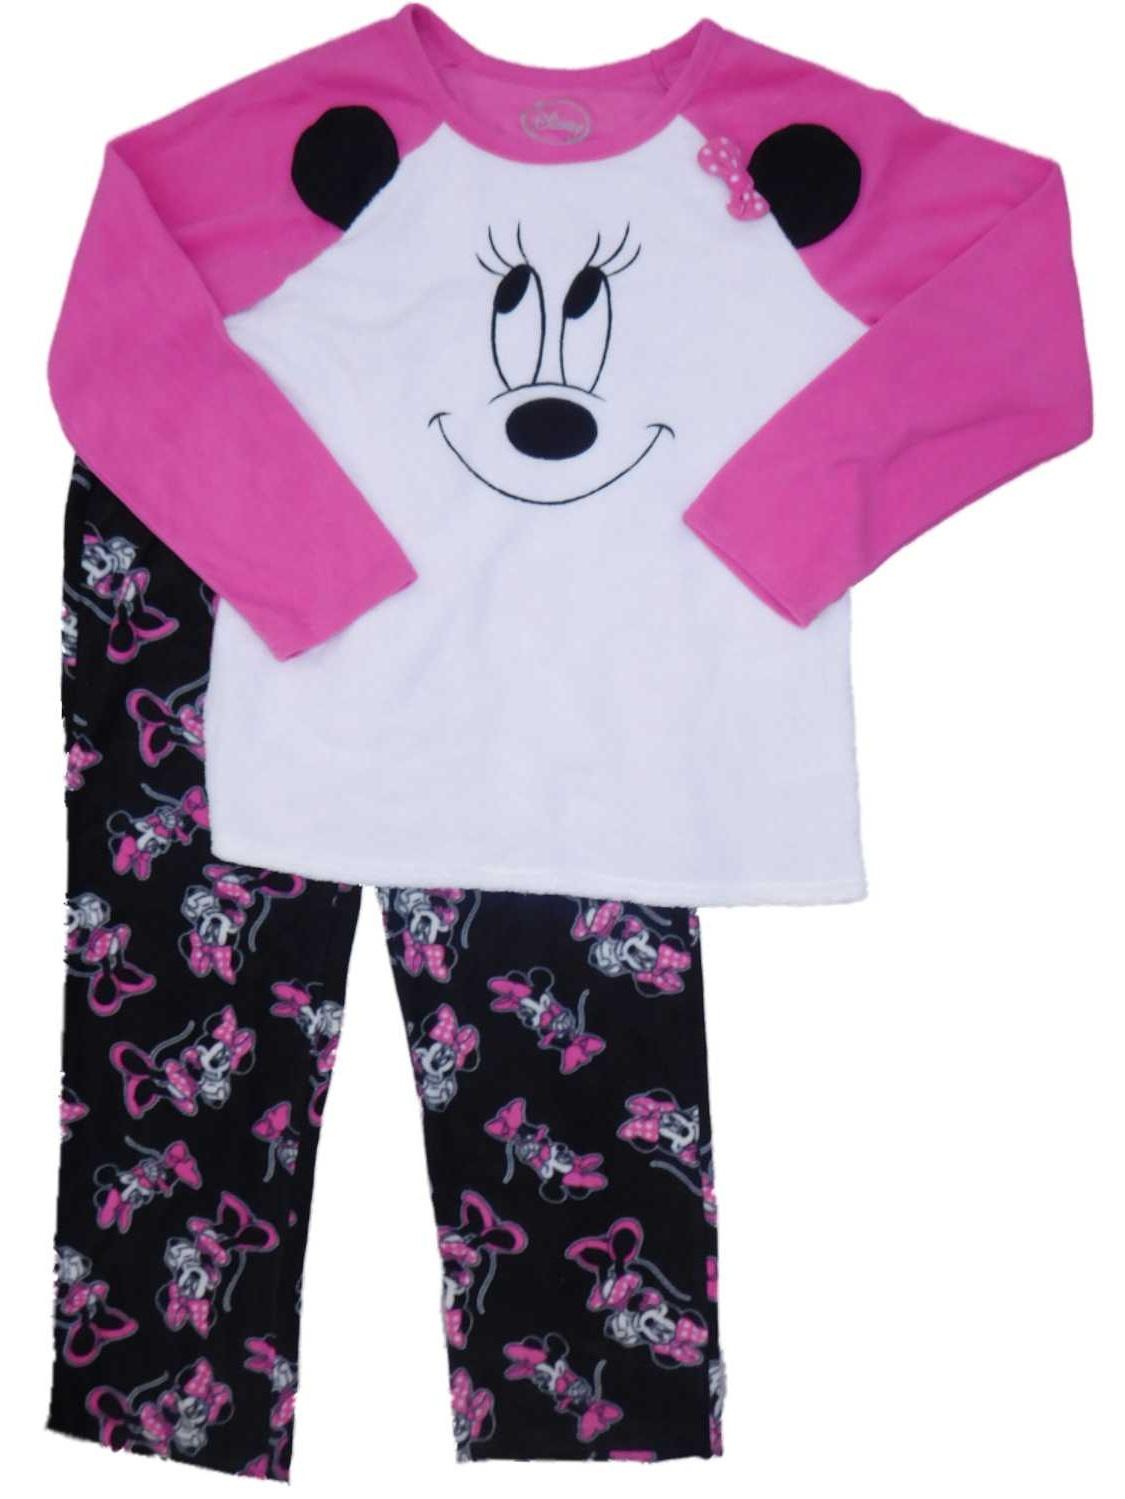 Womens Disney Minnie Mouse Fleece Face Pajamas Sleep Set